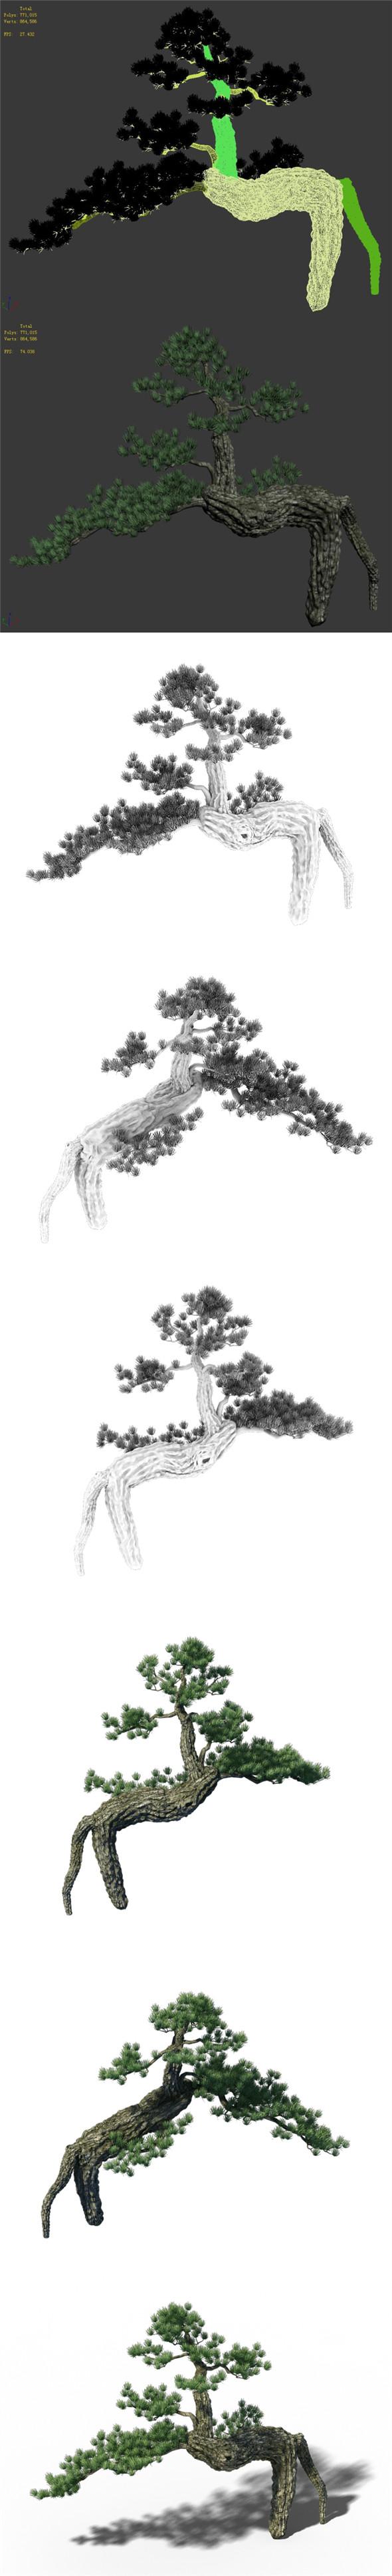 Big Tree - White Chishan - Pine 03 - 3DOcean Item for Sale